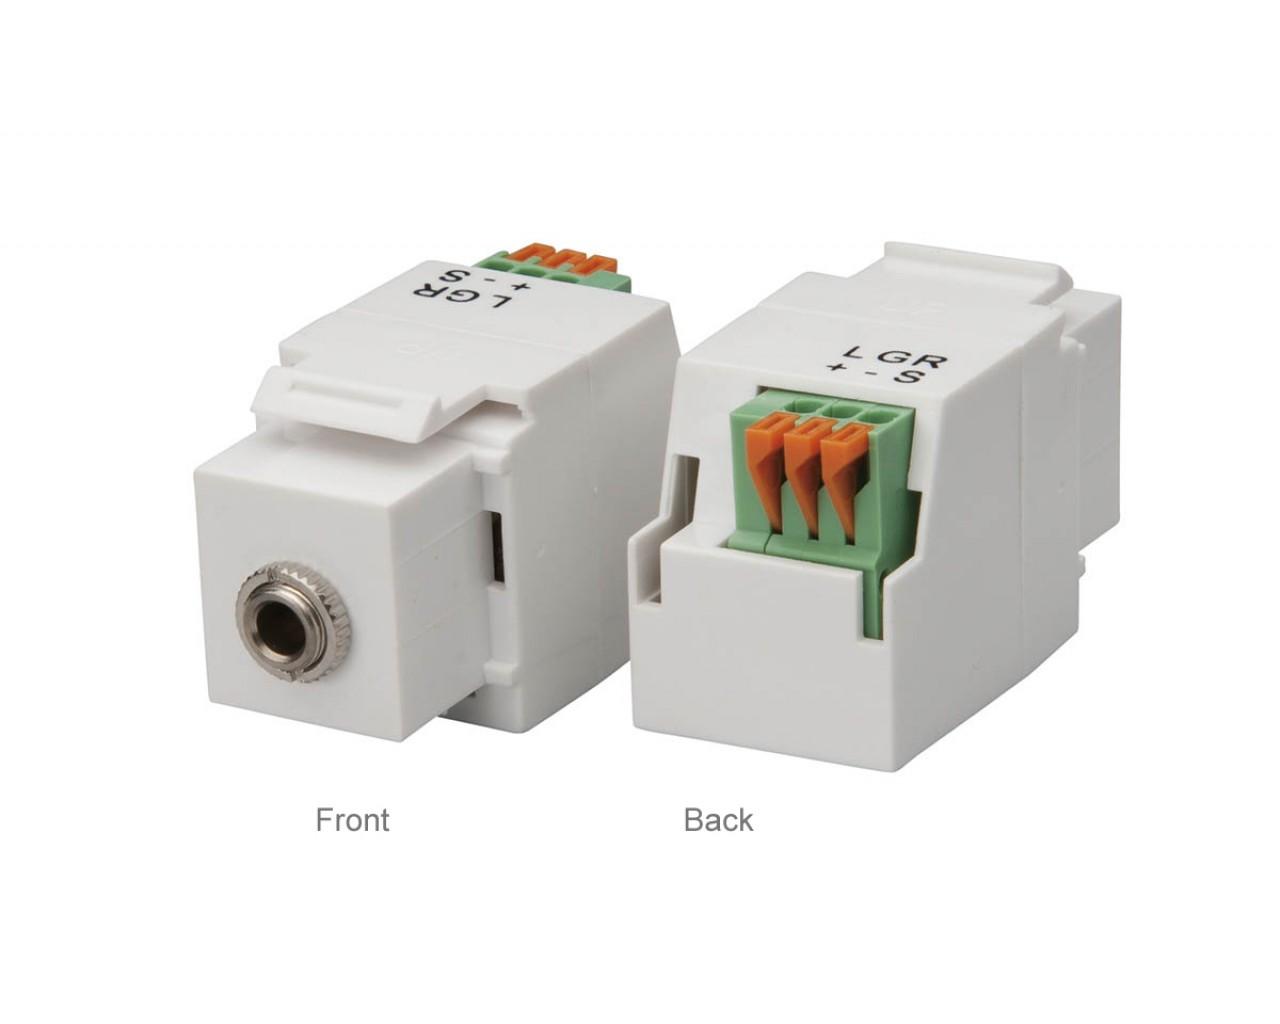 modular phone jack wiring diagram double pole mcb ethernet hub elsavadorla